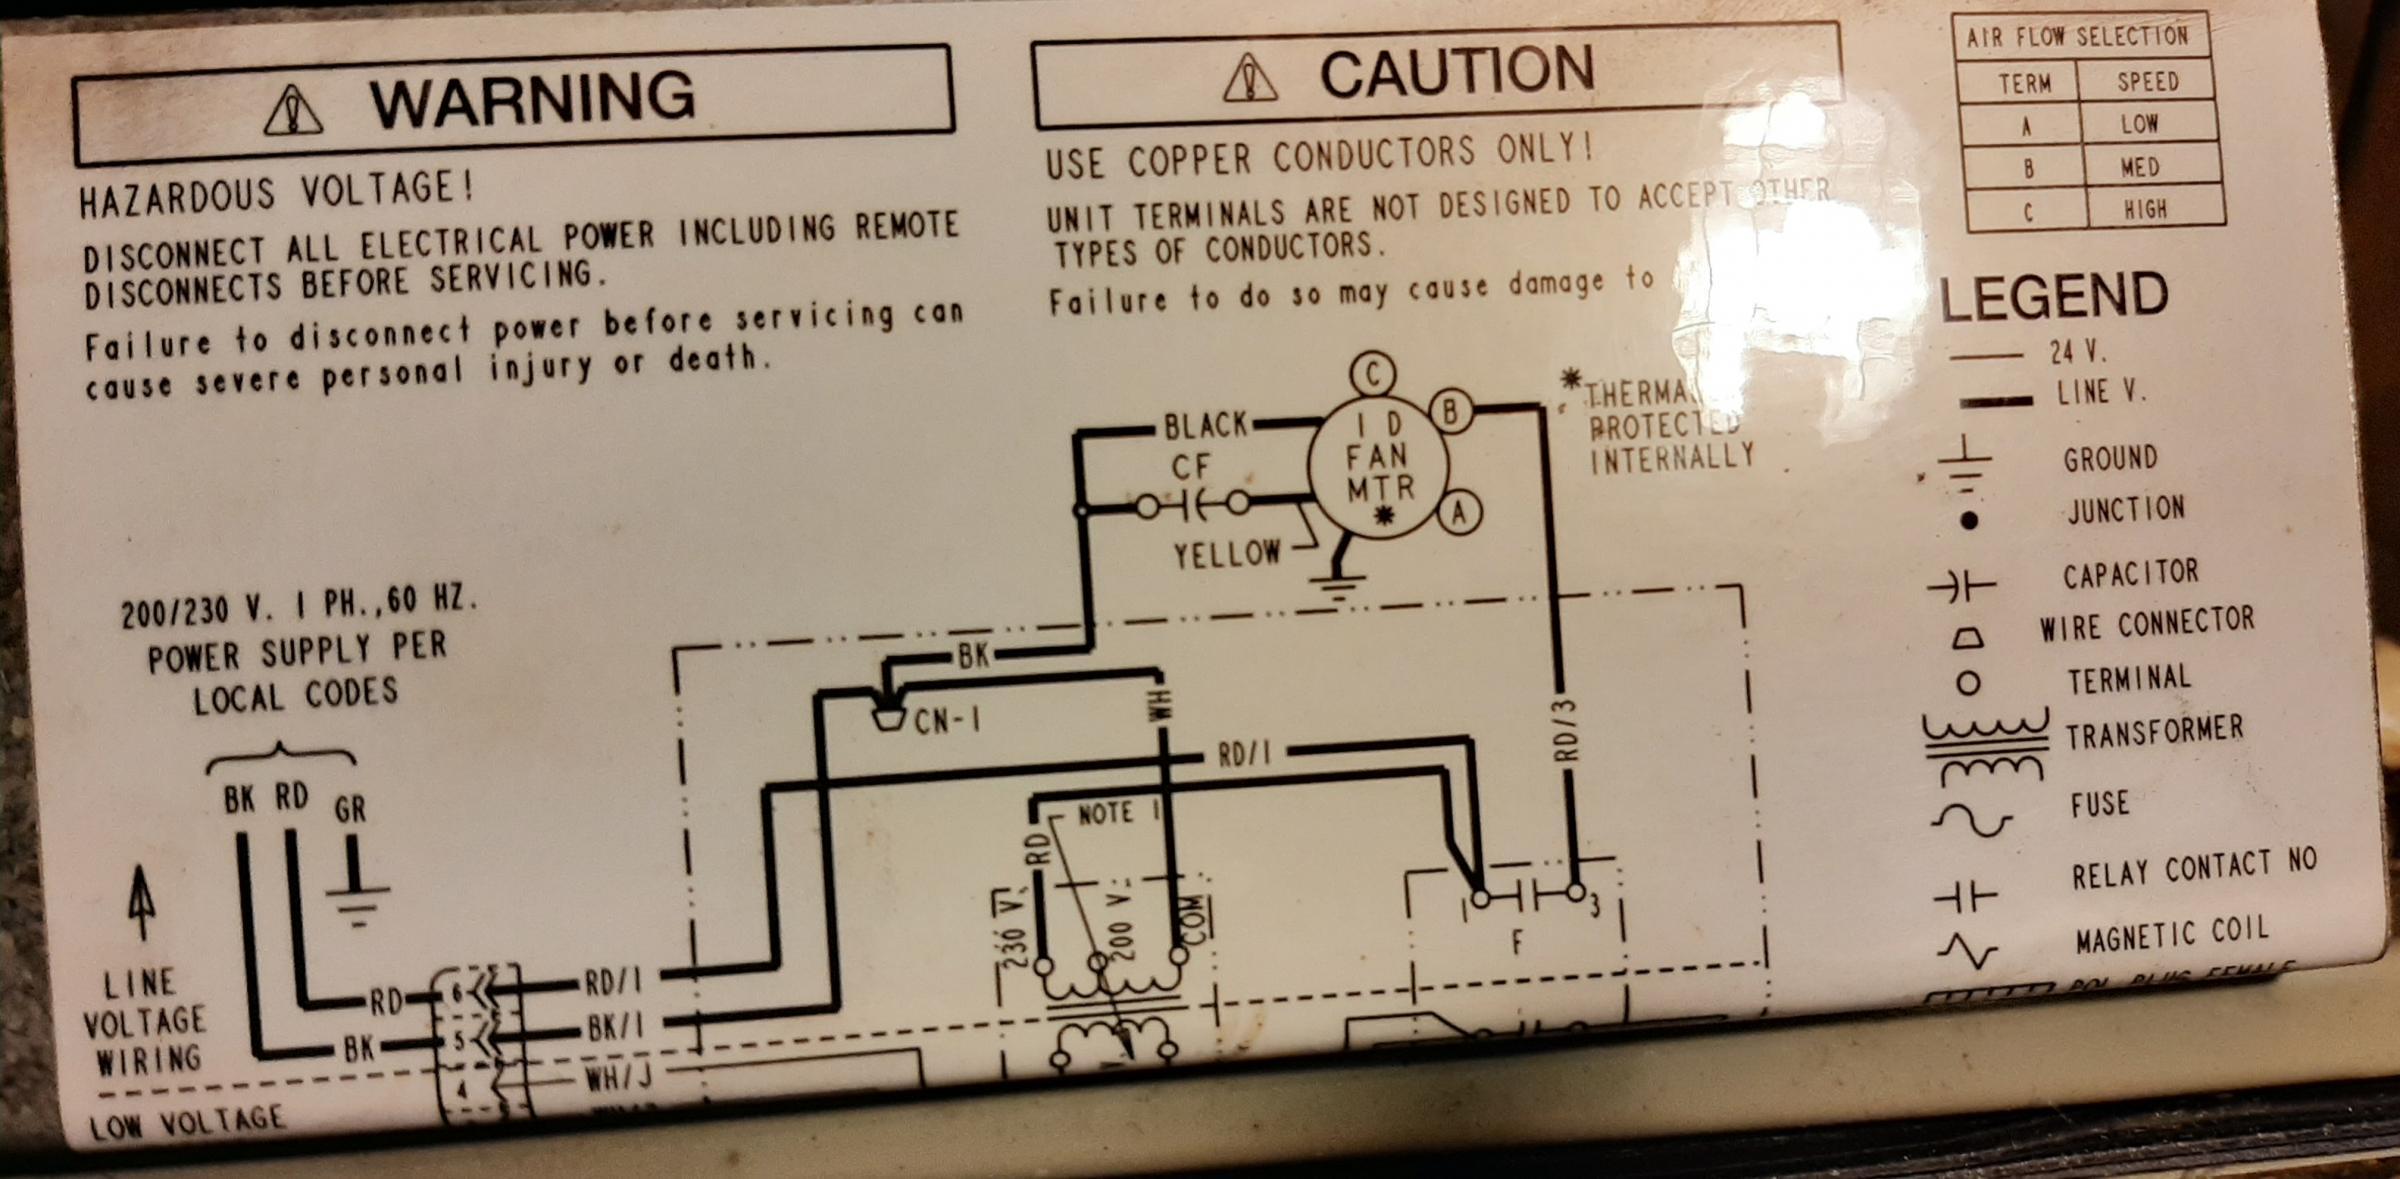 Need some blower motor wiring help-20200212_210516_1581560828181.jpg